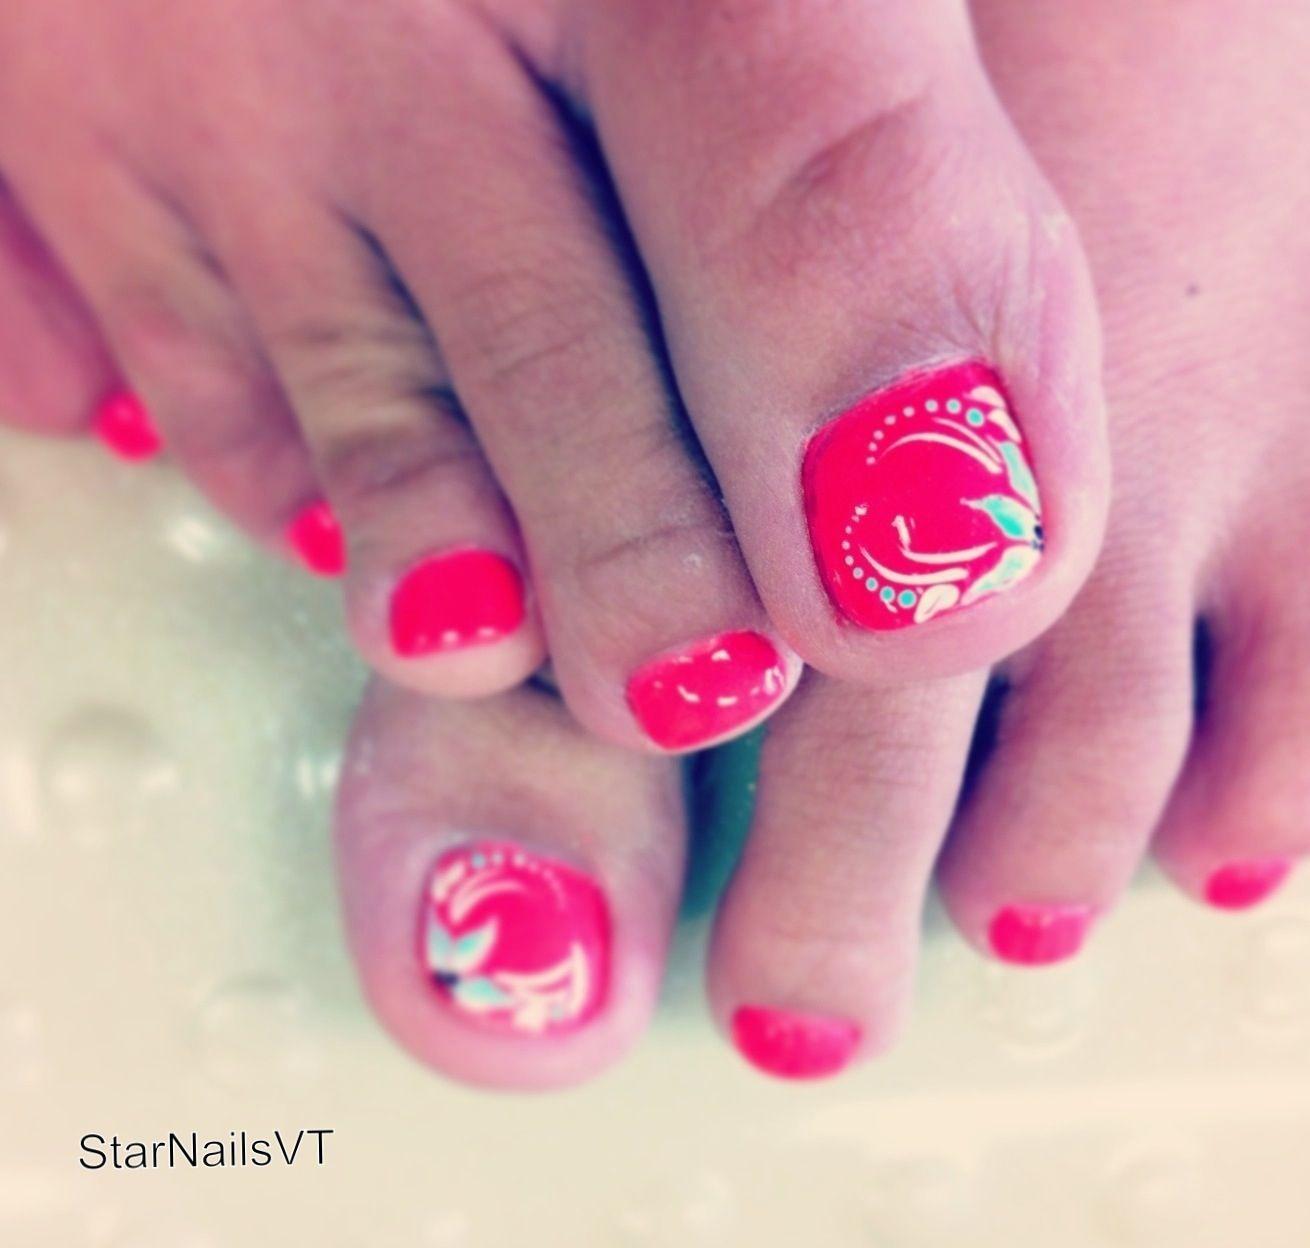 Toe nail design - popculturez.com. Love the intricate design, very ...